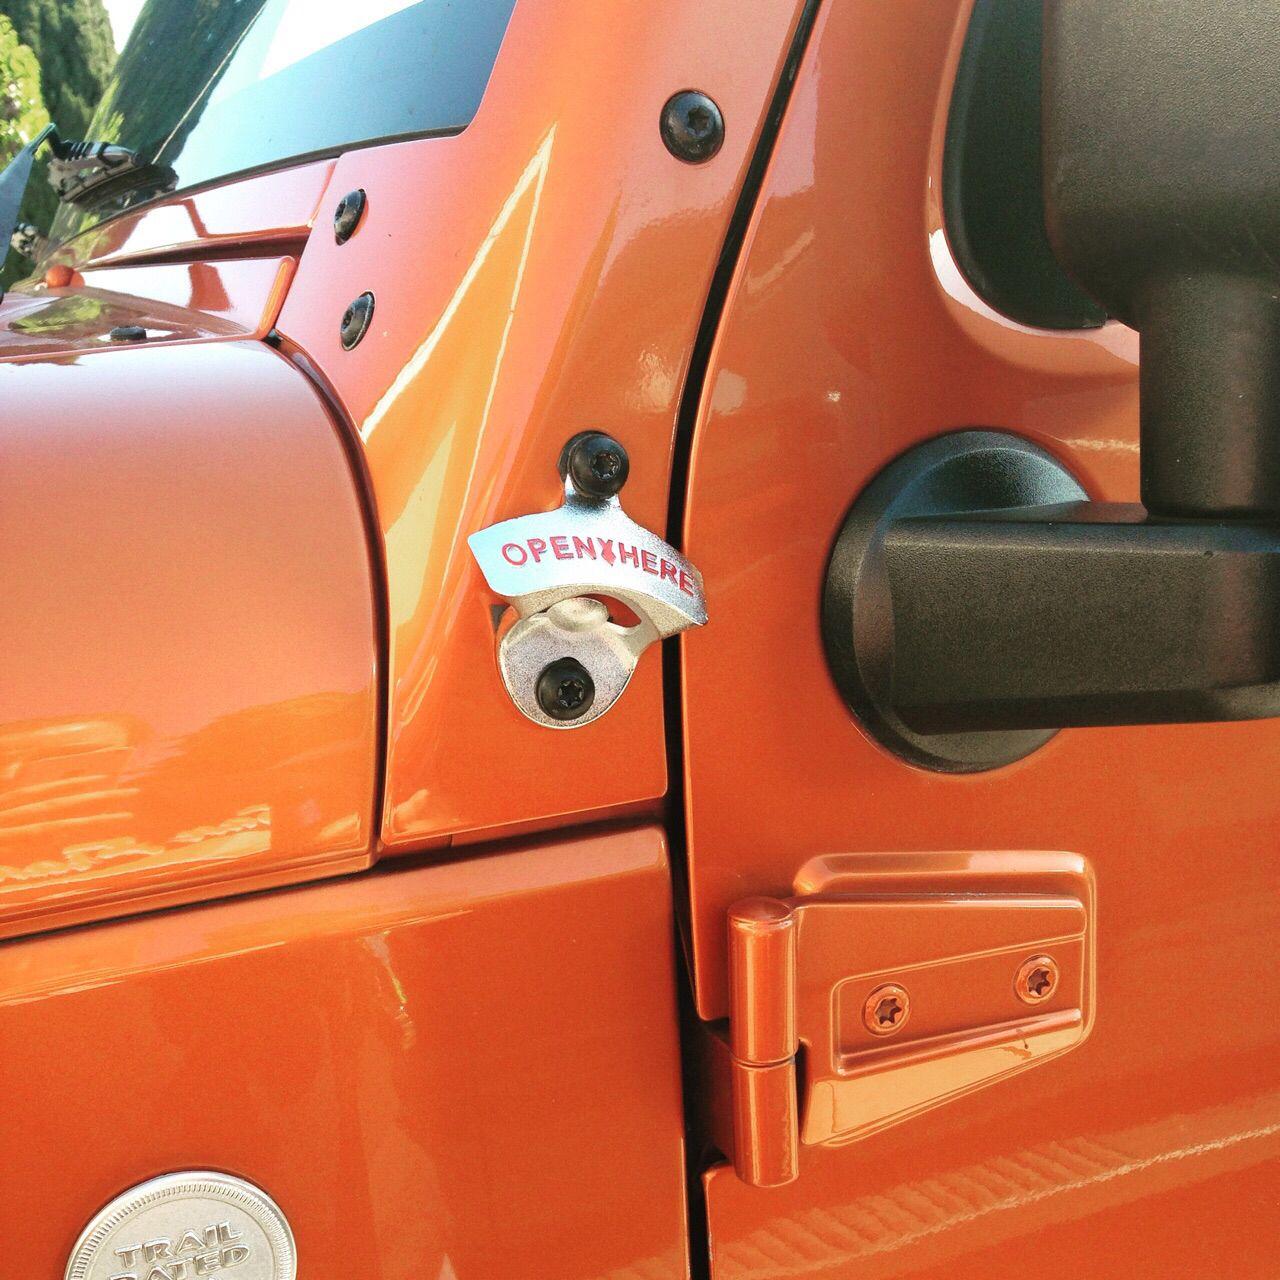 Independent Car Sticker 1pc Cute Monkey Graphic Vinyl Car Decal Custom For Jeep Wrangler Rubicon Sport Sahara 4 Doors 2 Doors 2018 Automobiles & Motorcycles